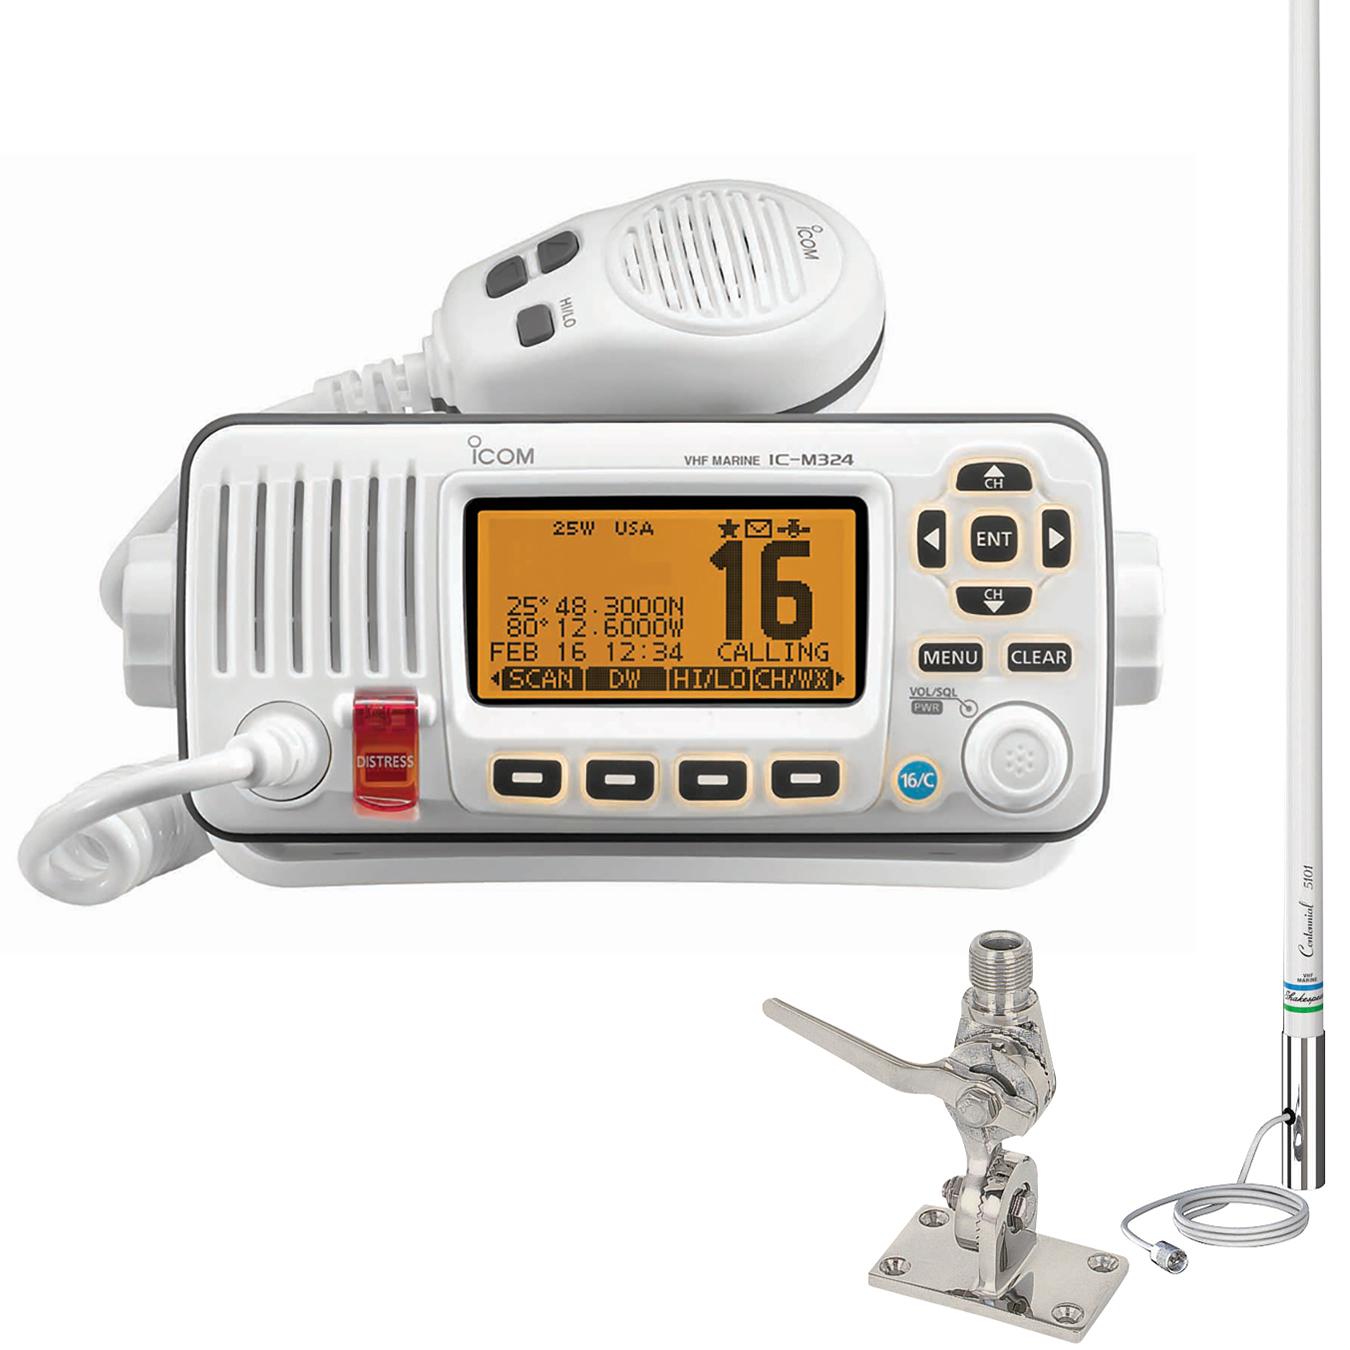 ICOM M324 VHF Marine Radio Package White, w/5101 Classic 8' Antenna and SS Mount